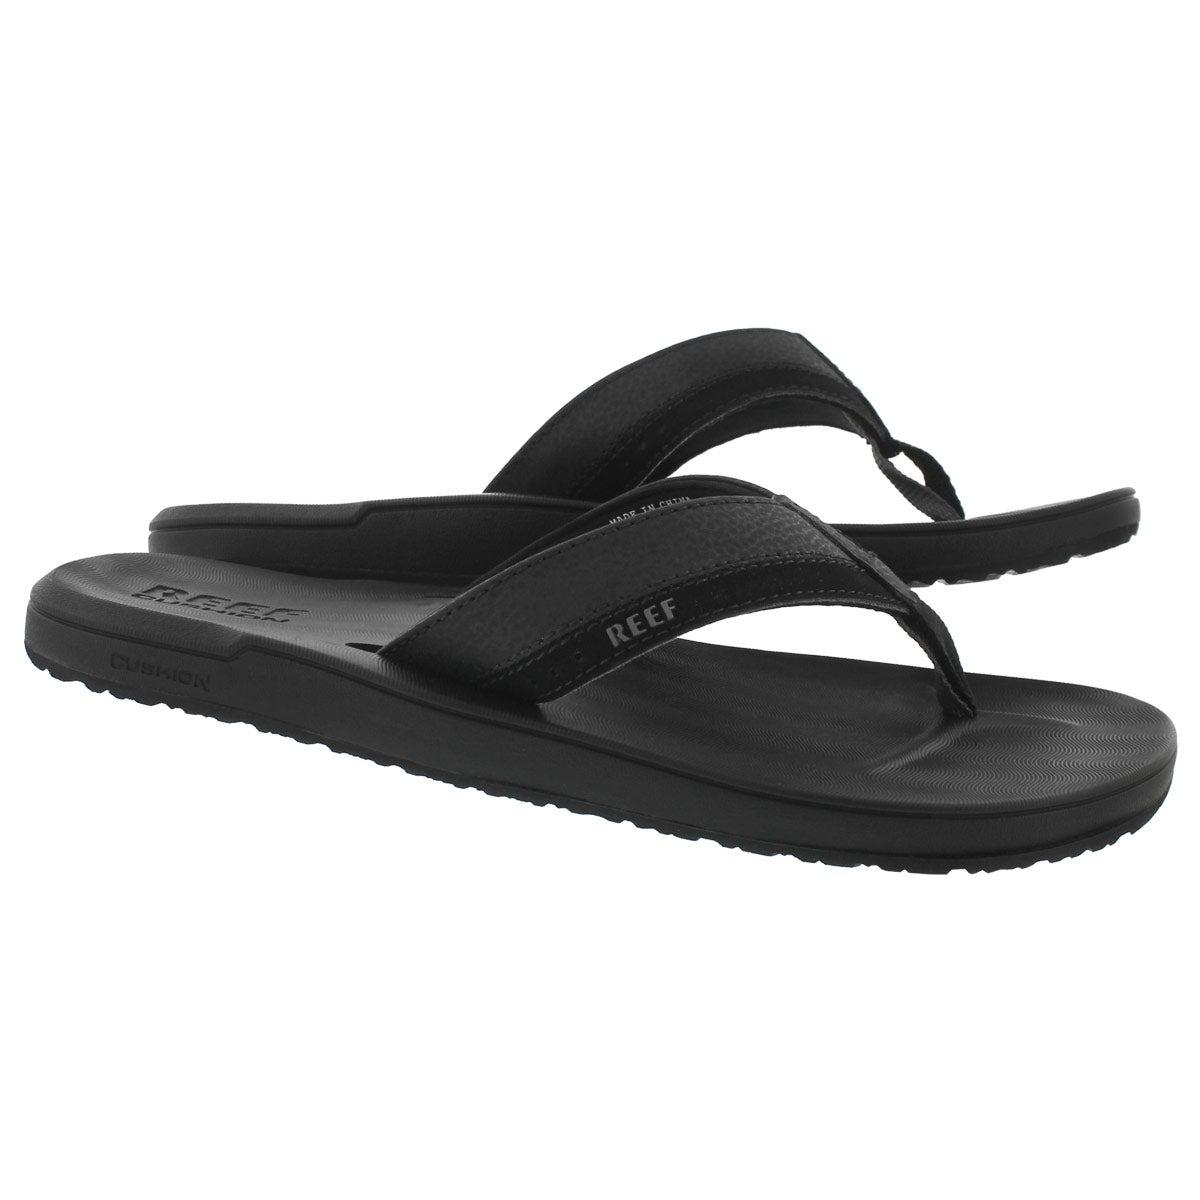 Mns Contoured Cushion black thong sandal